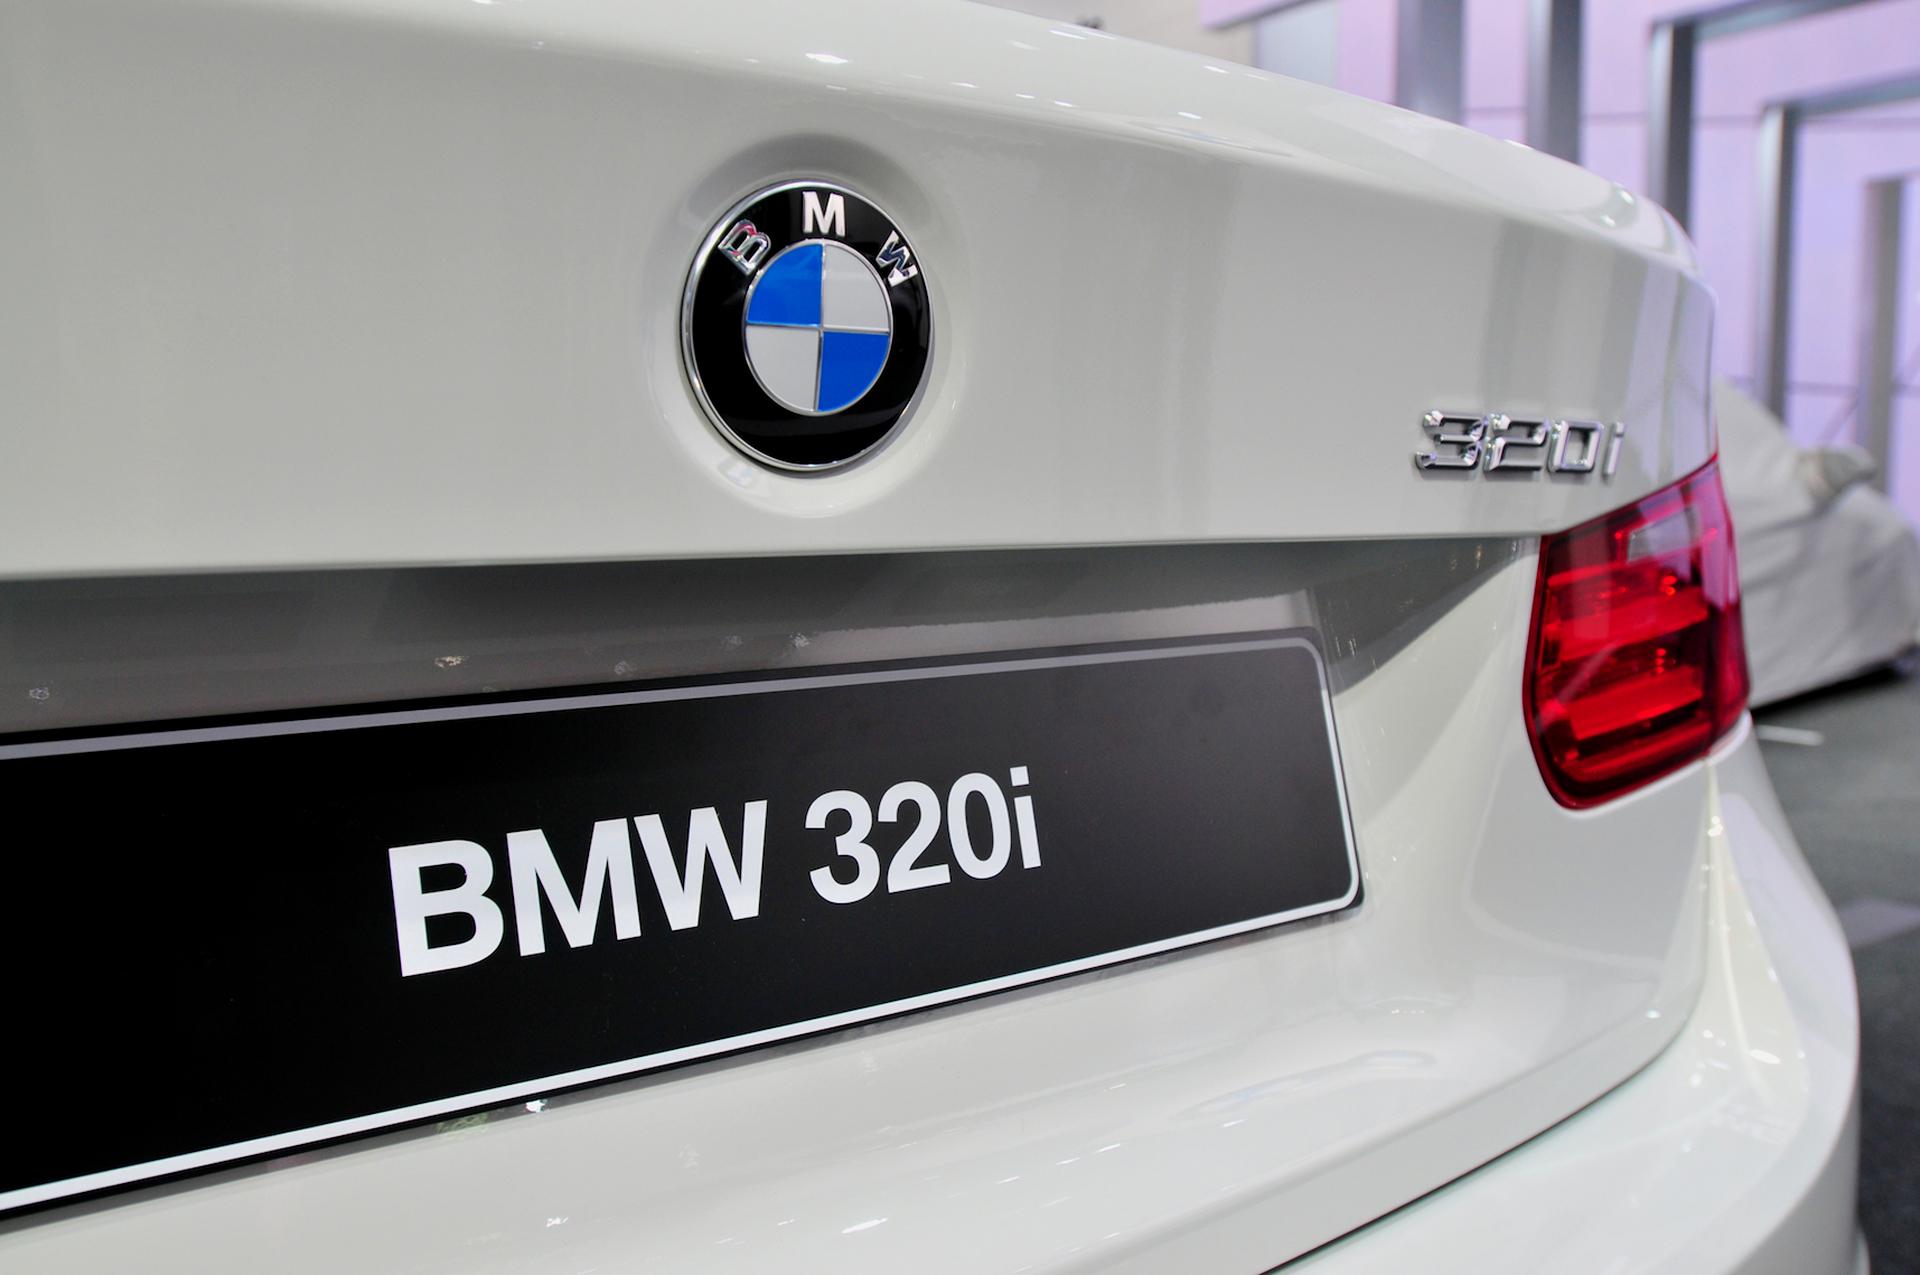 bmw announces 320i and 320i xdrive for u s market priced at 33 445 BMW 335I Wallpaper bmw 320i usa vital stats